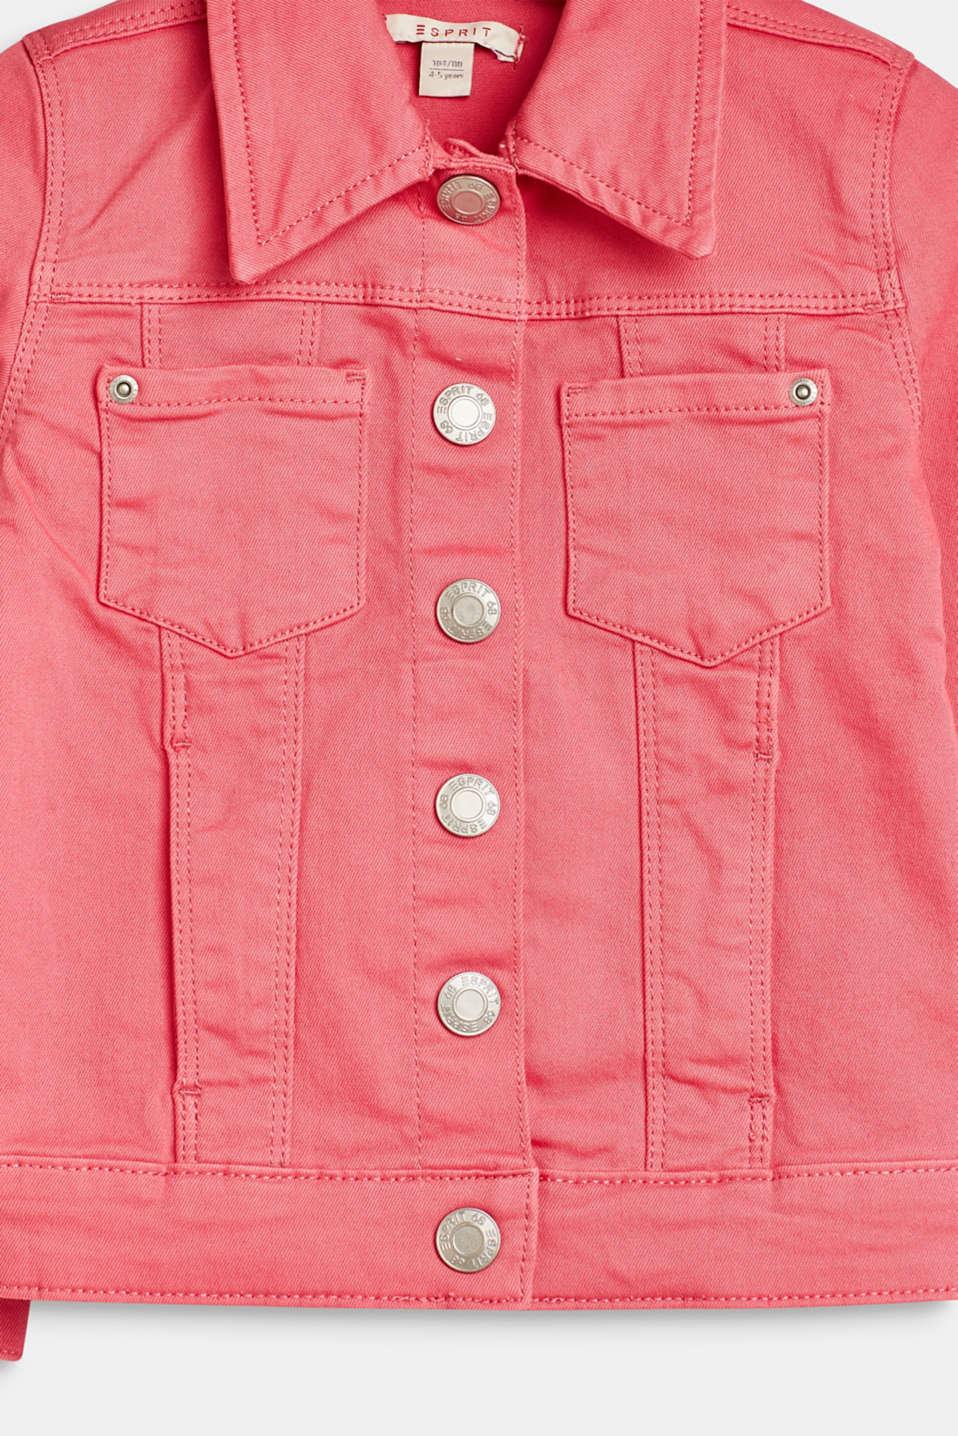 Jackets outdoor denim, LCDARK PINK, detail image number 2